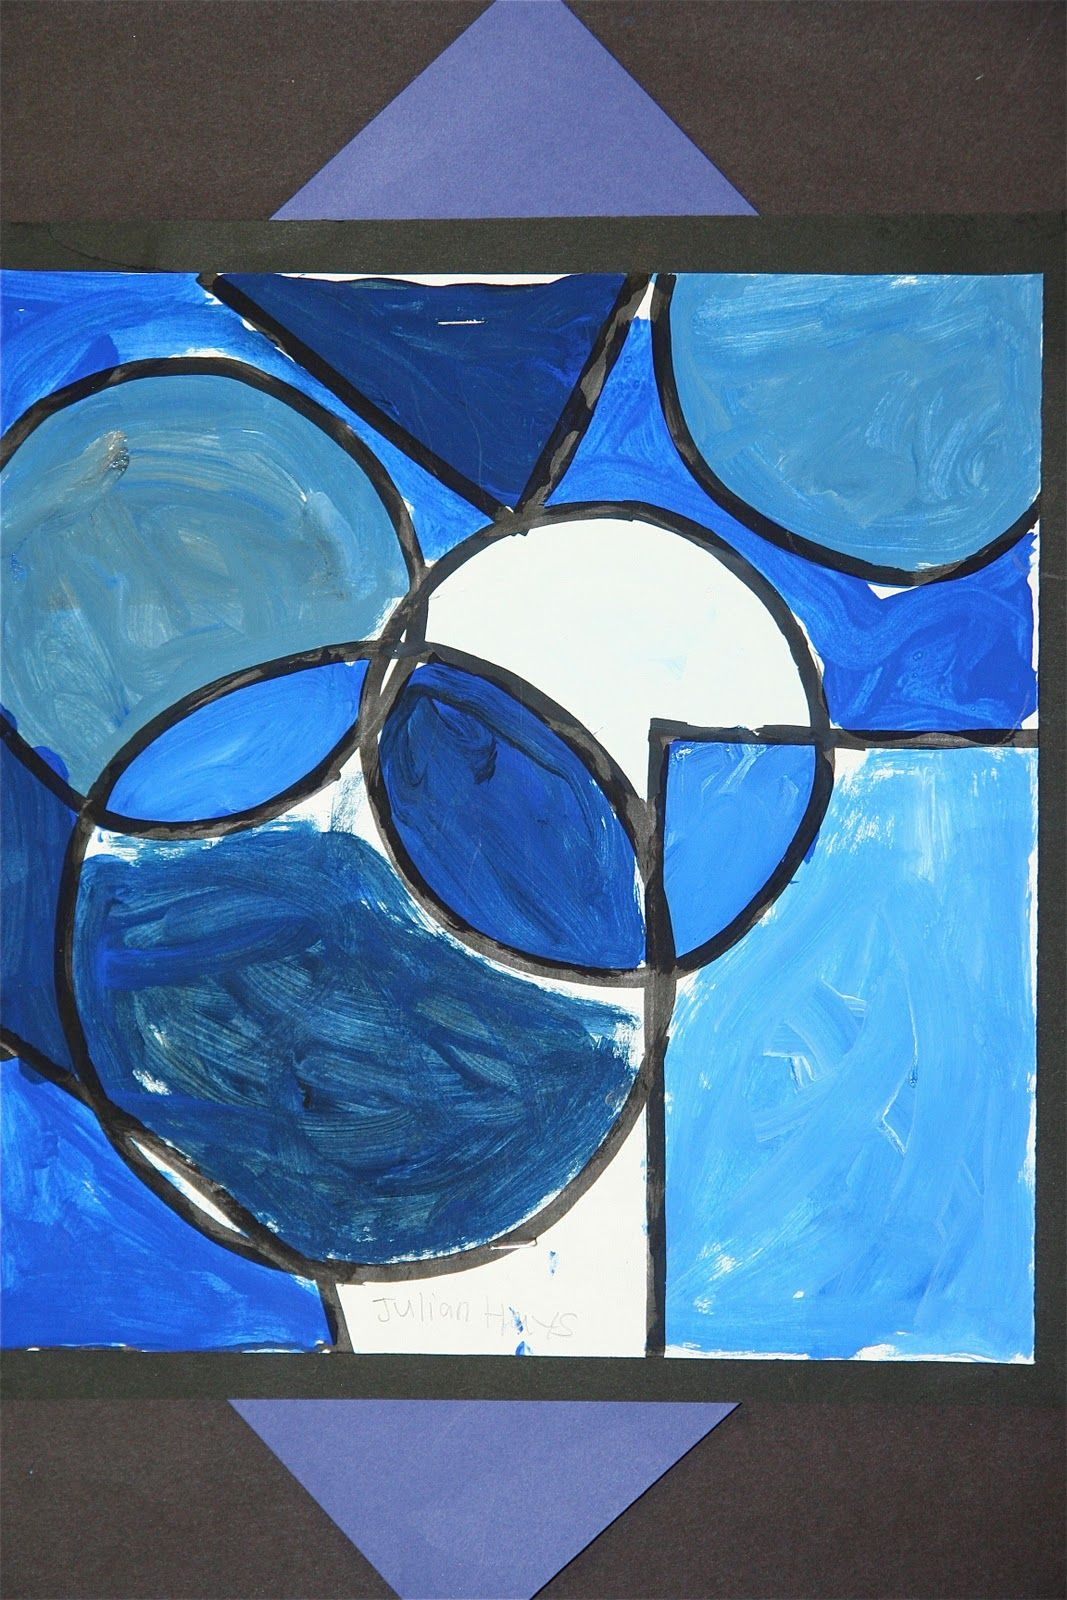 Monochromatic Paintings: Use idea with similar figures ...